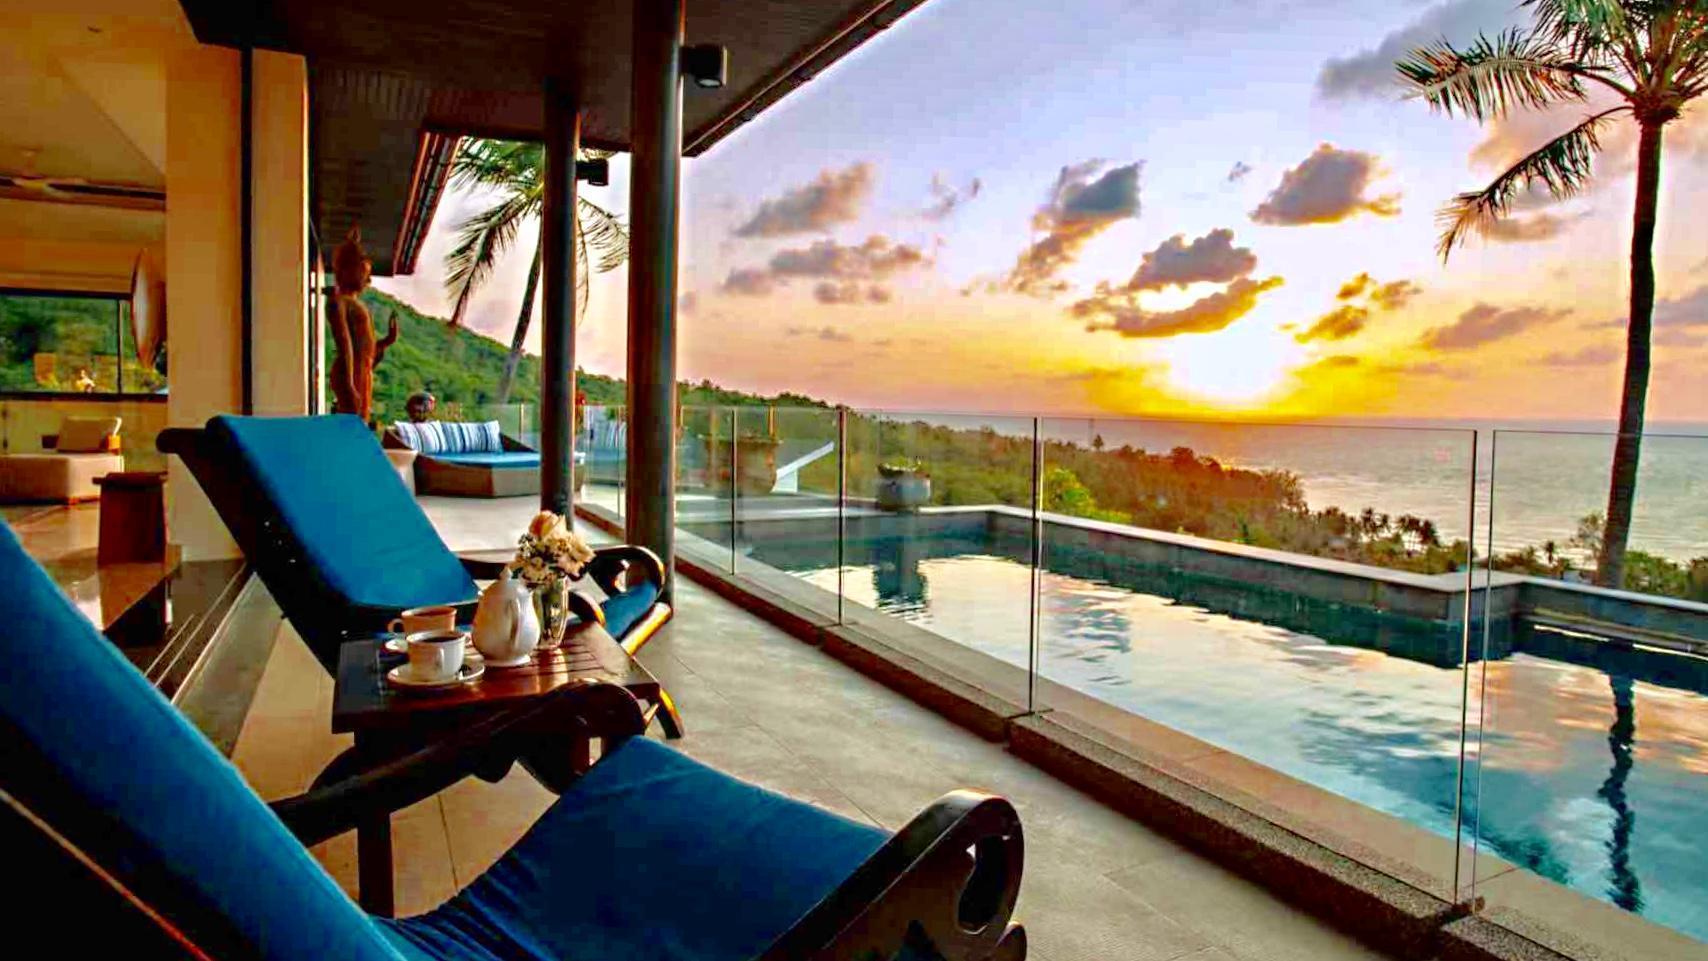 1st Cape, Koh Samui + Sea View + Pool + Video Room วิลลา 4 ห้องนอน 4 ห้องน้ำส่วนตัว ขนาด 320 ตร.ม. – หาดละไม